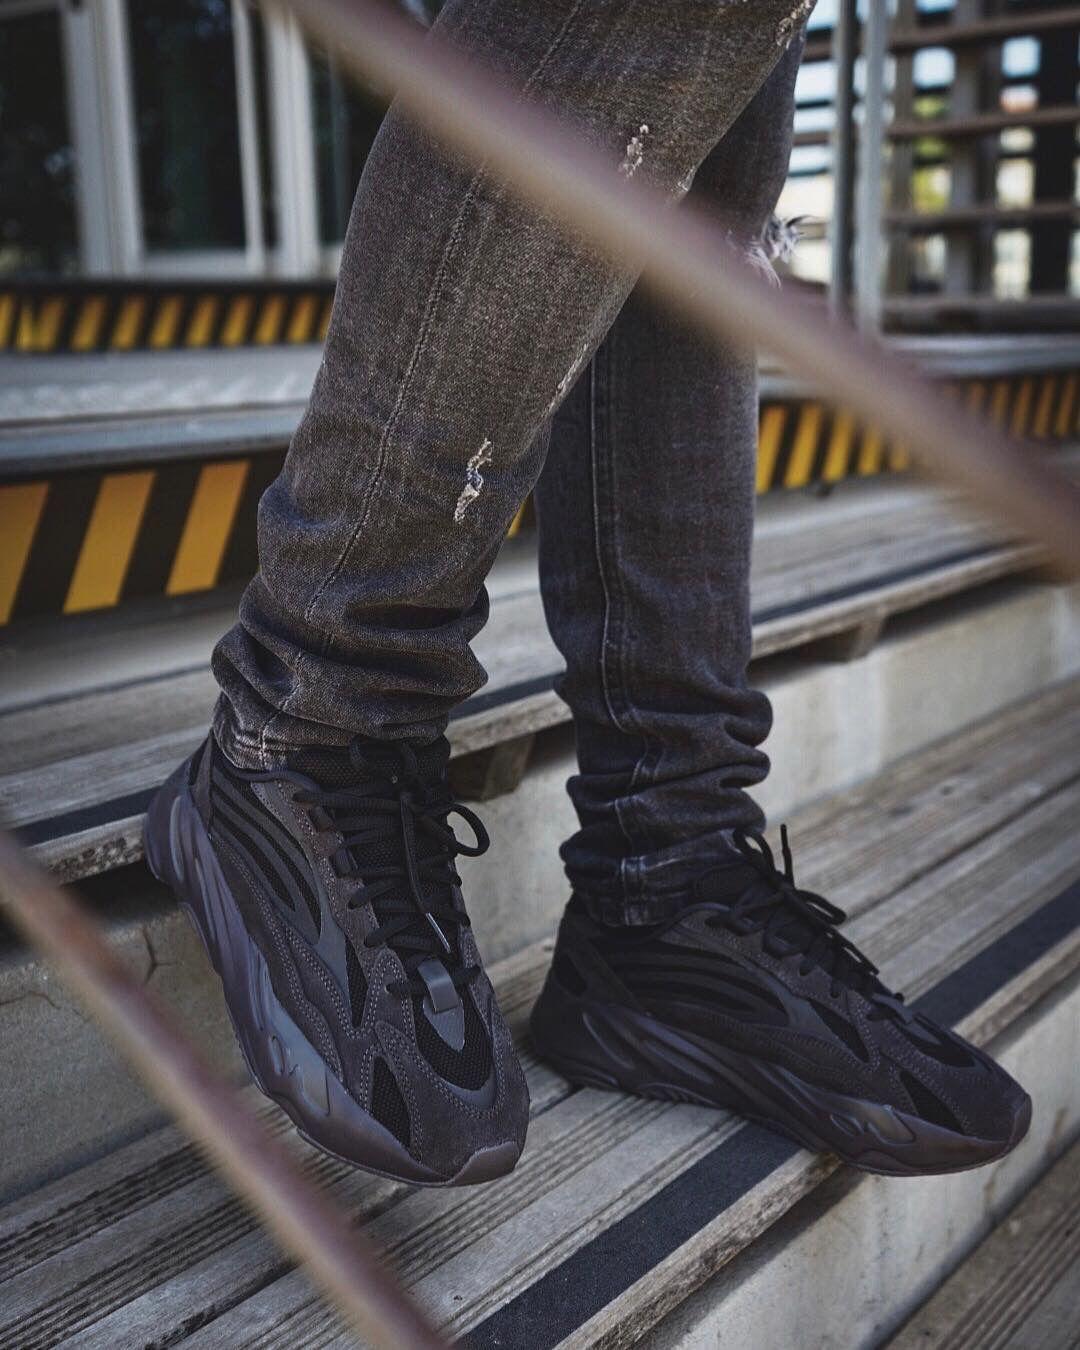 capacidad Misionero Ahuyentar  Buy Women Yeezy 750 Boost Lookbook Black Sale 73